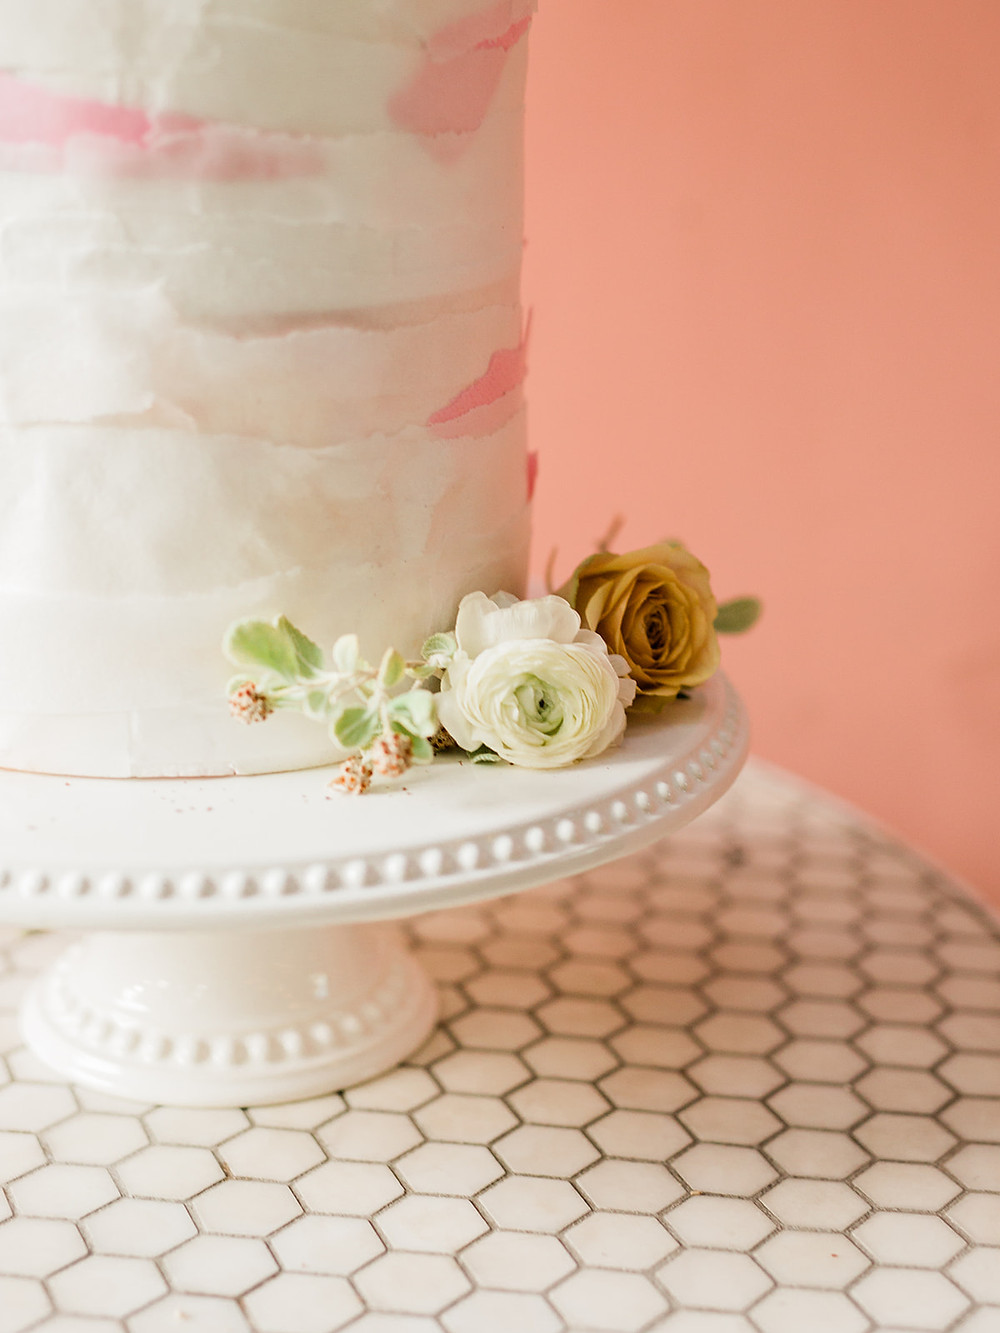 cake design - Modern Moroccan Desert Glam Editorial - LGBTQ Wedding Editoiral - Wedding Design Inspiration - Muted Desert Tones - Modern Glam Jungle Chic